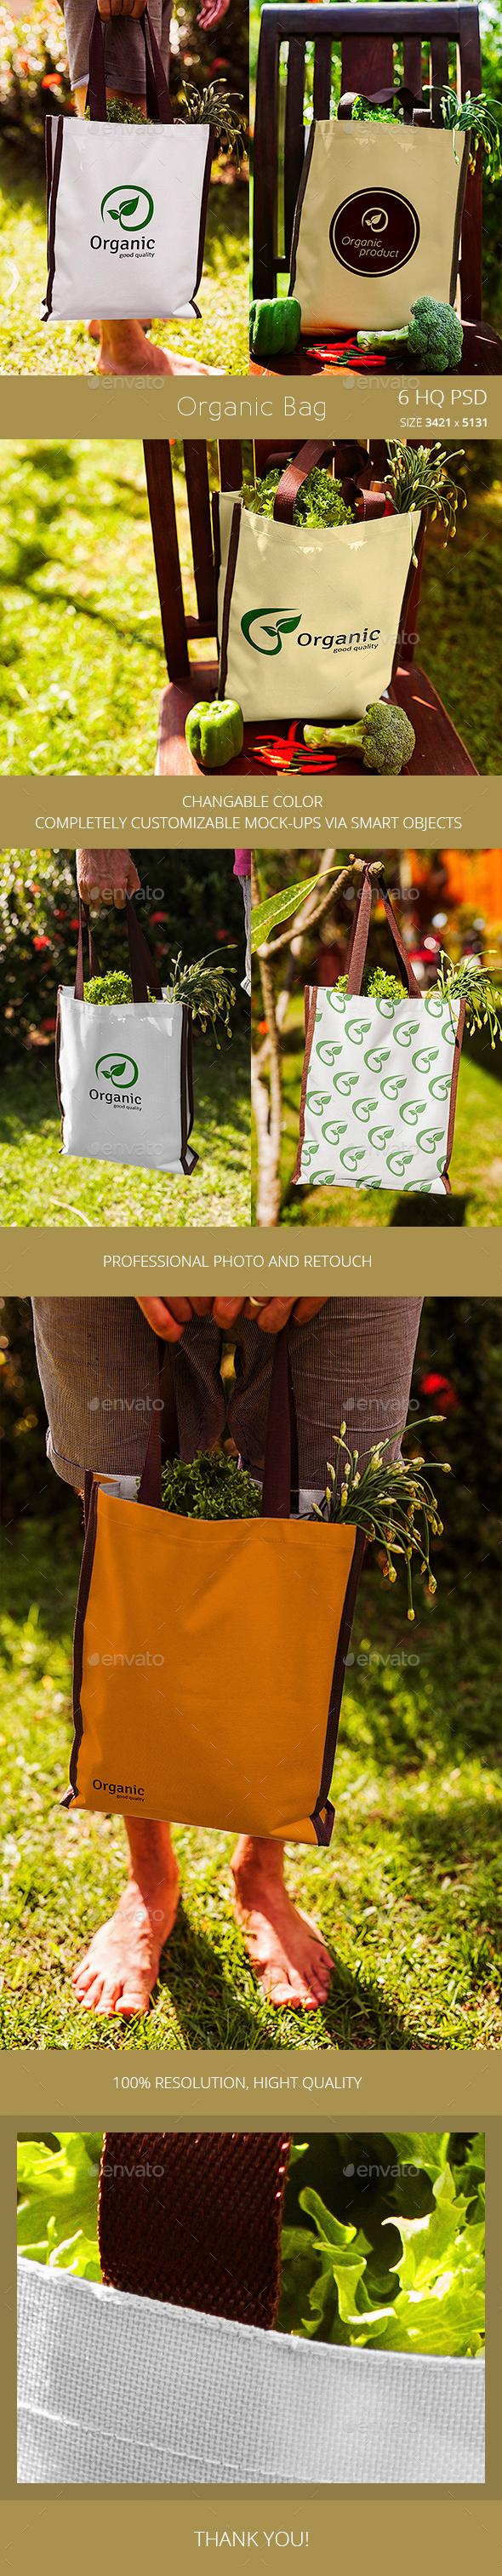 Organic Shopping Bag - Product Mock-Ups Graphics